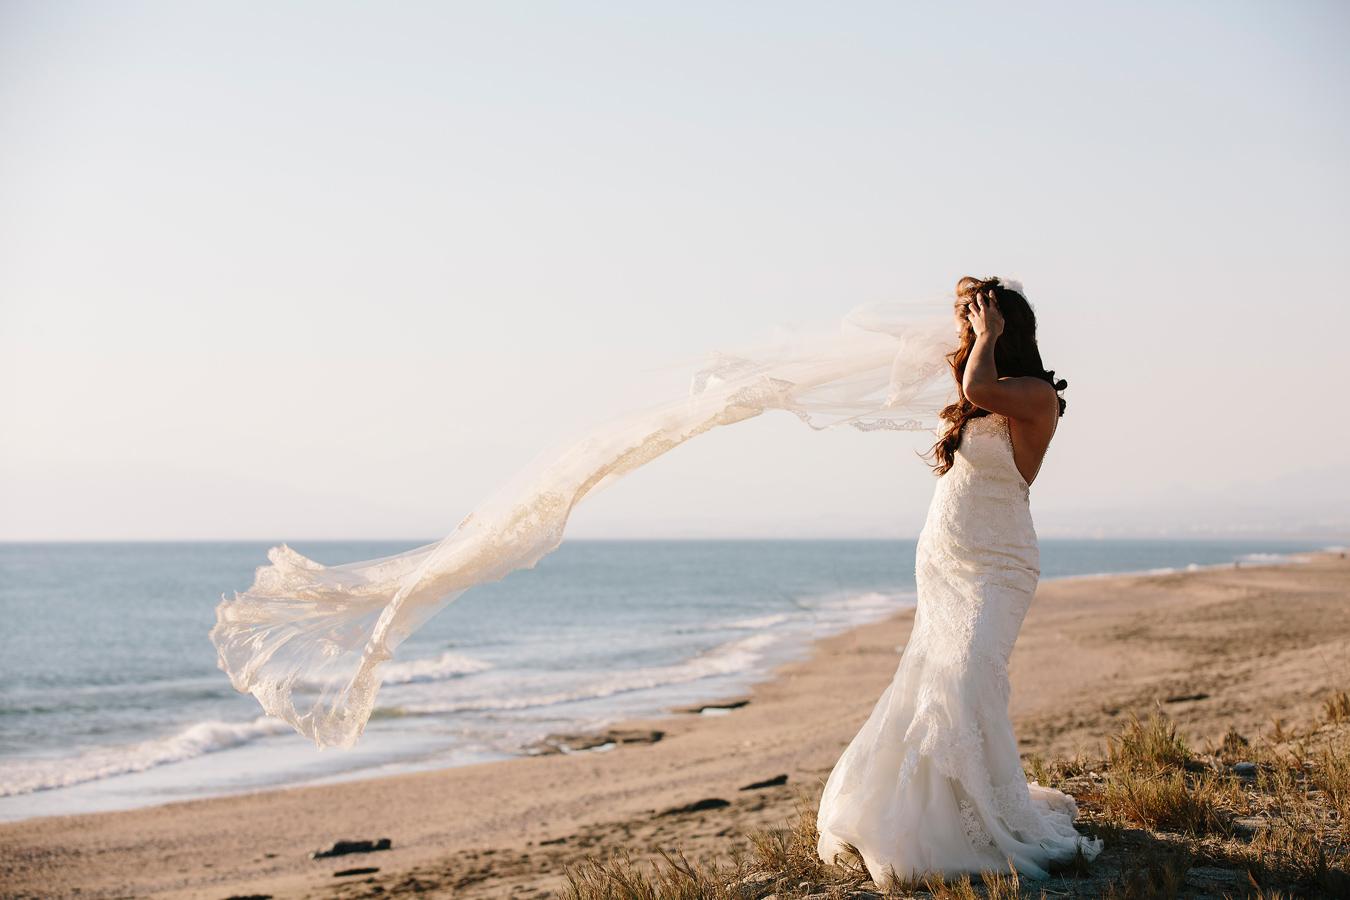 fotografo de boda malaga almeria archidona postboda